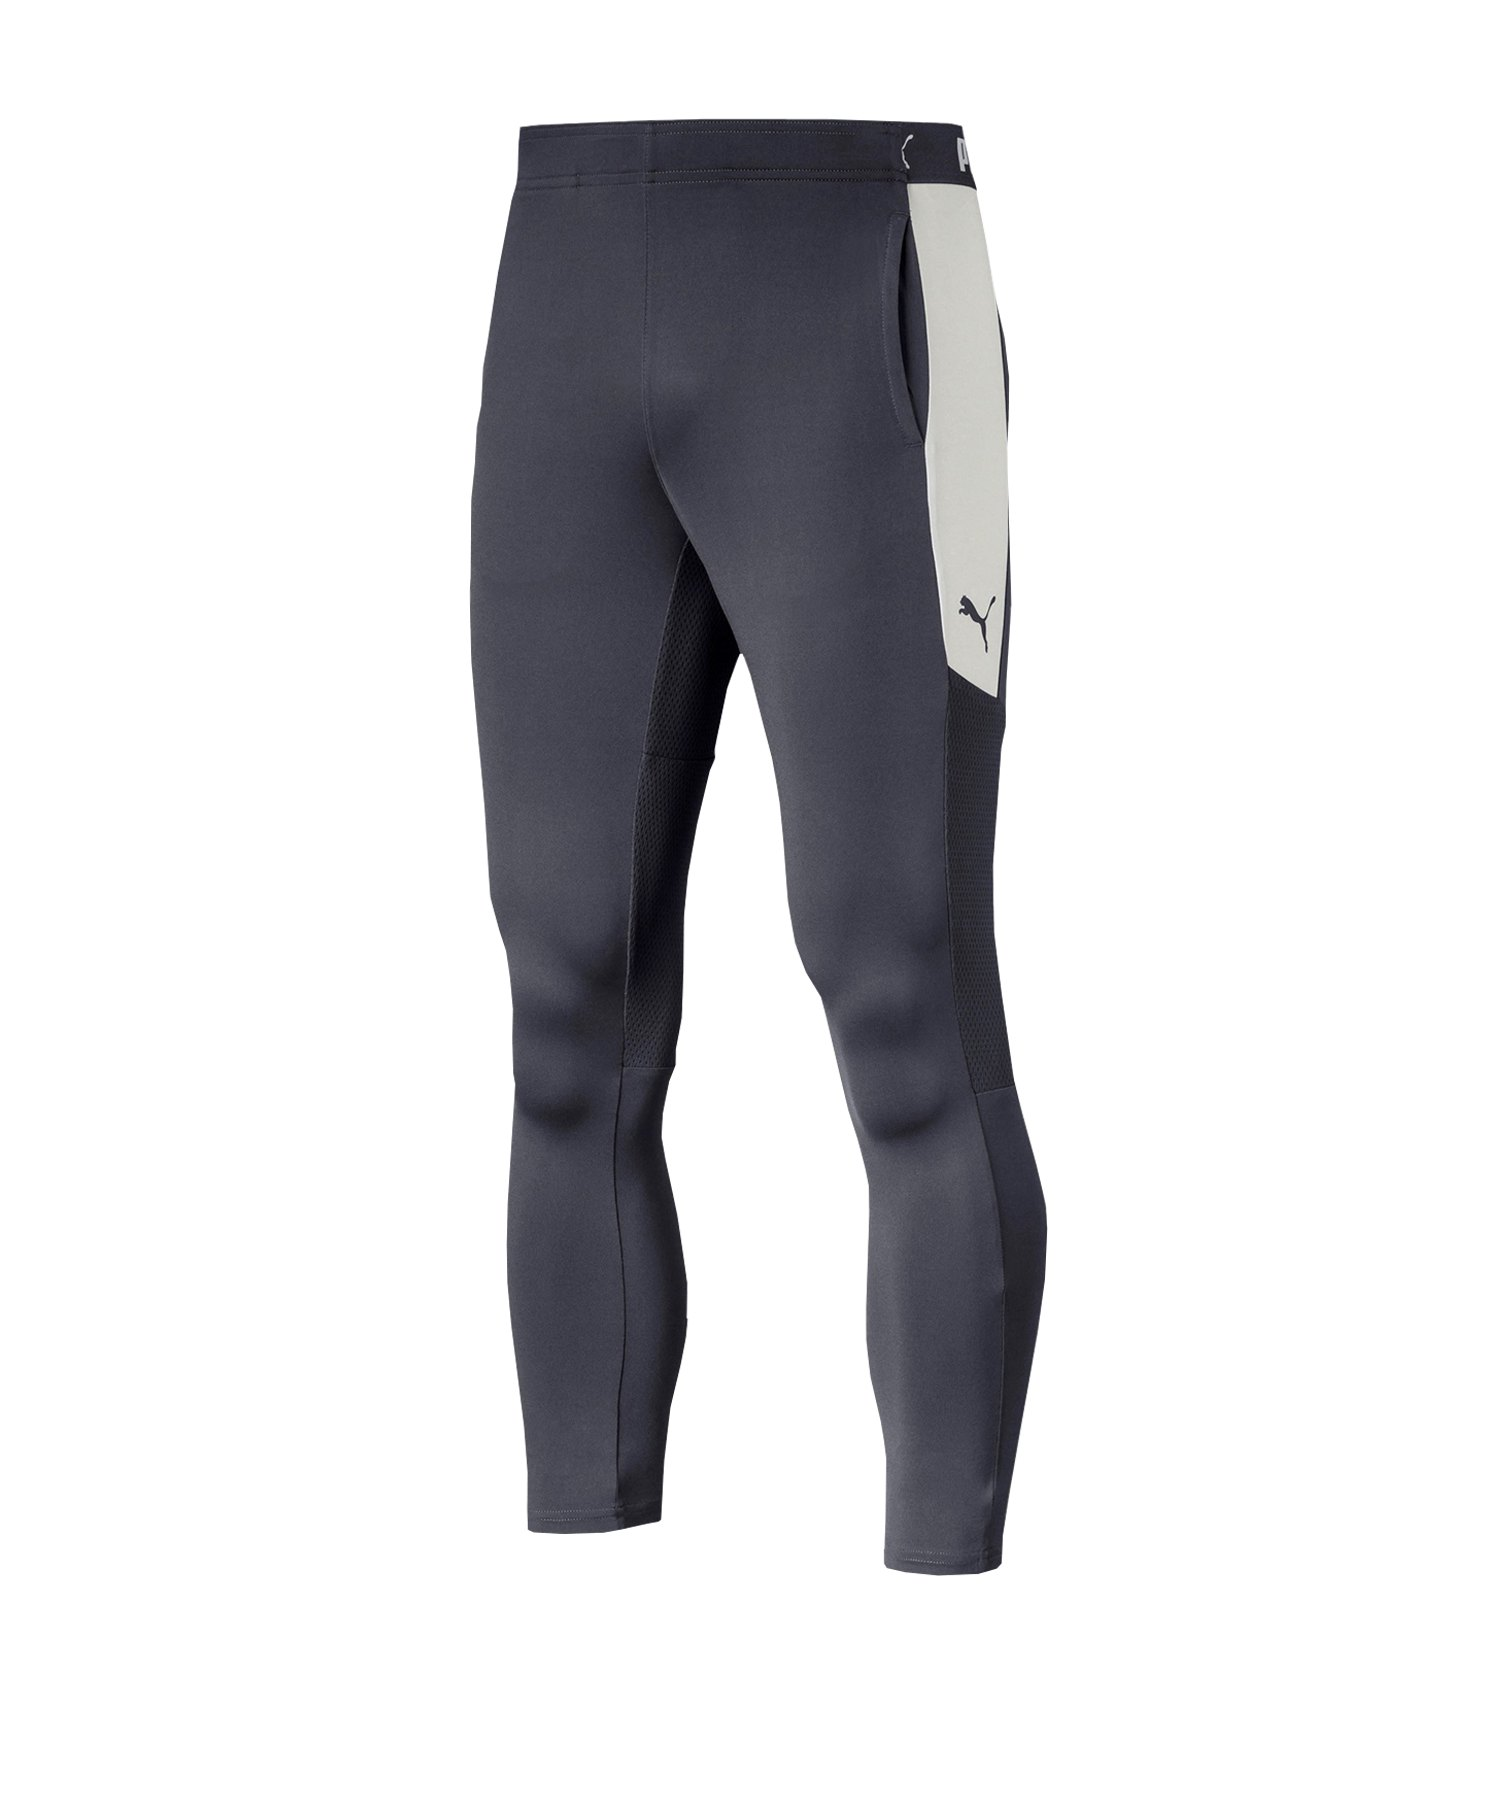 PUMA ftblNXT Pant Jogginghose Grau F02 - Grau